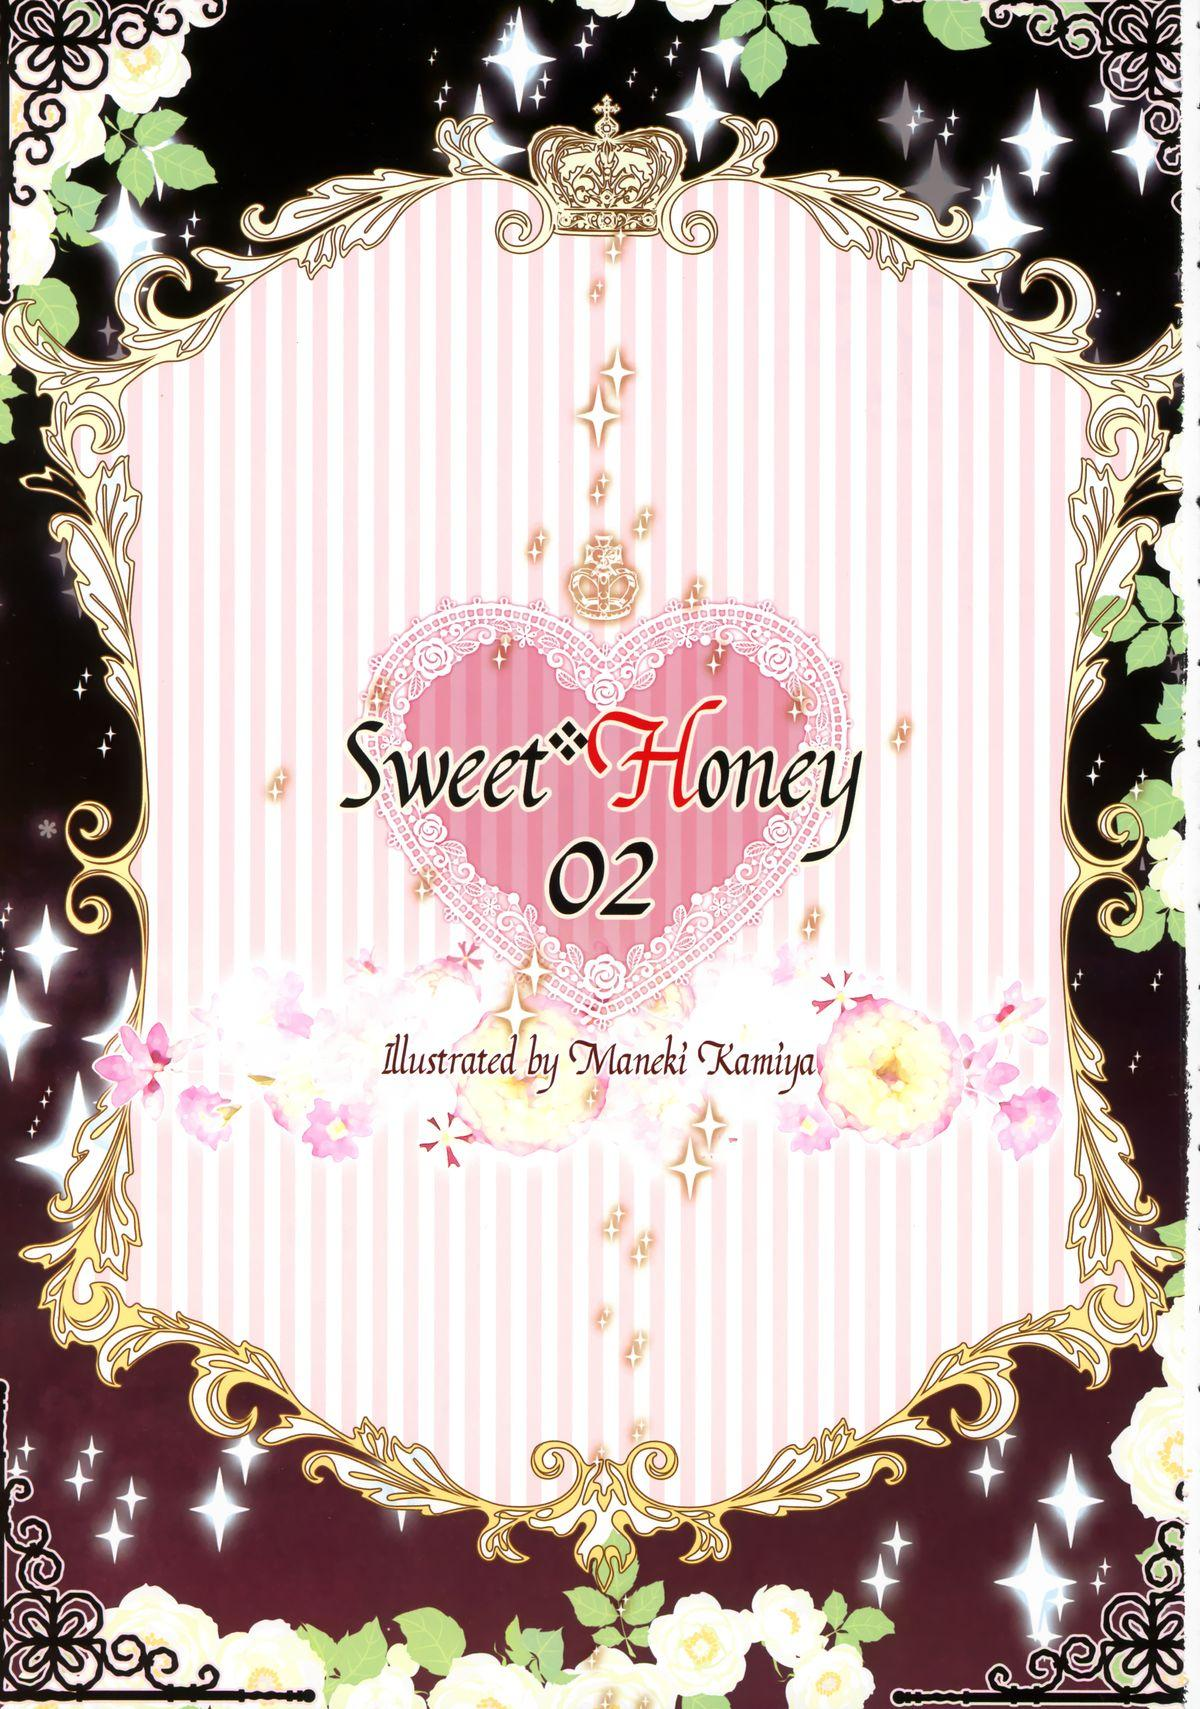 Sweet * Honey 02 1